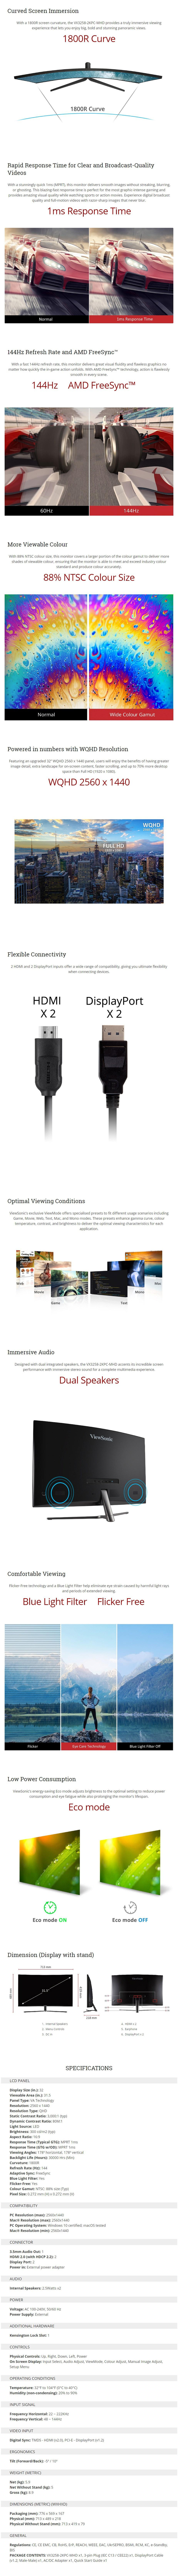 "Viewsonic VX3258-2KPC-MHD 32"" 144Hz WQHD FreeSync VA Curved Gaming Monitor - Overview 1"